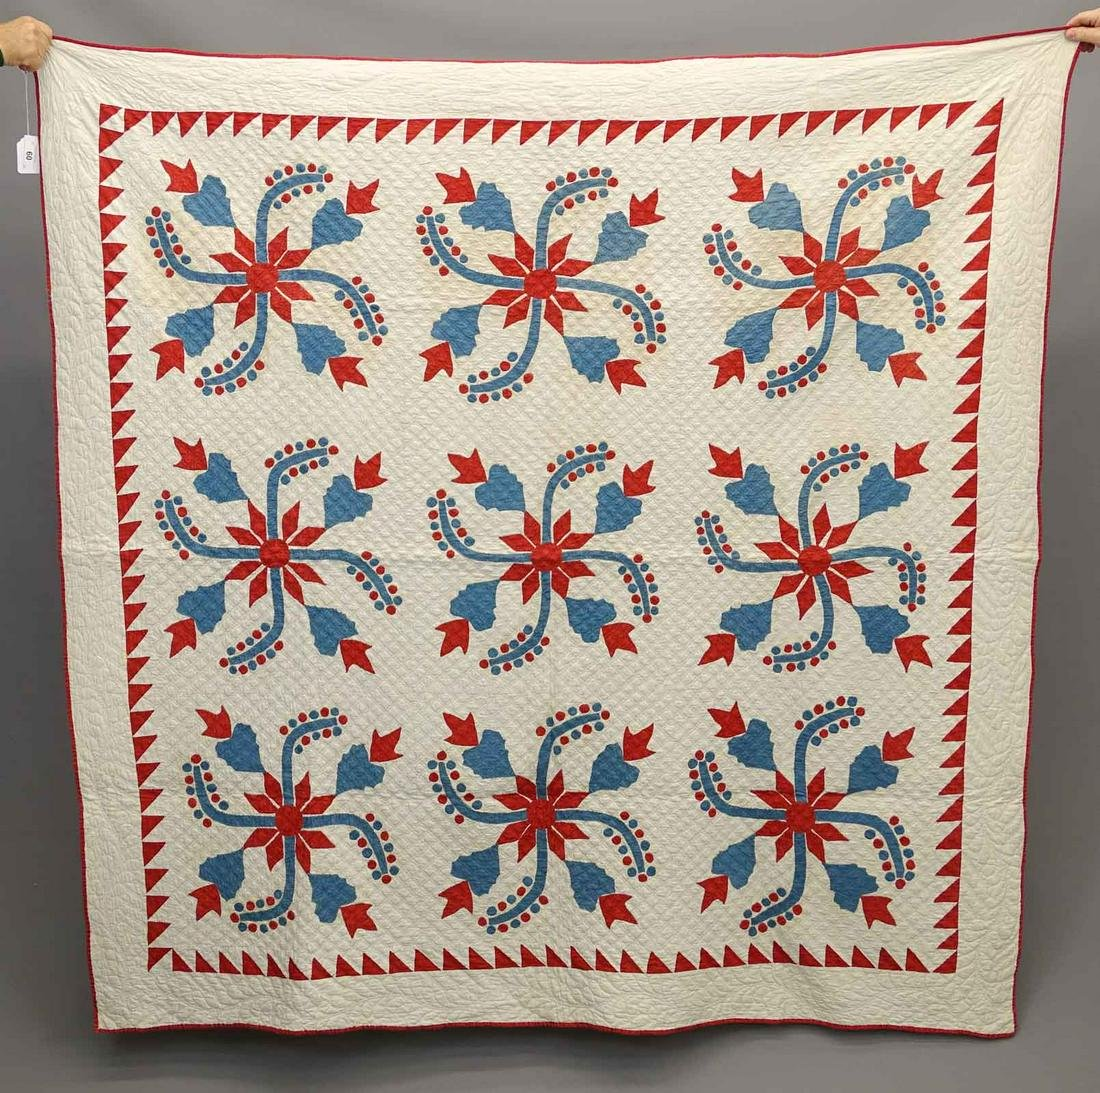 C. 1870 Blue & Red Applique Quilt